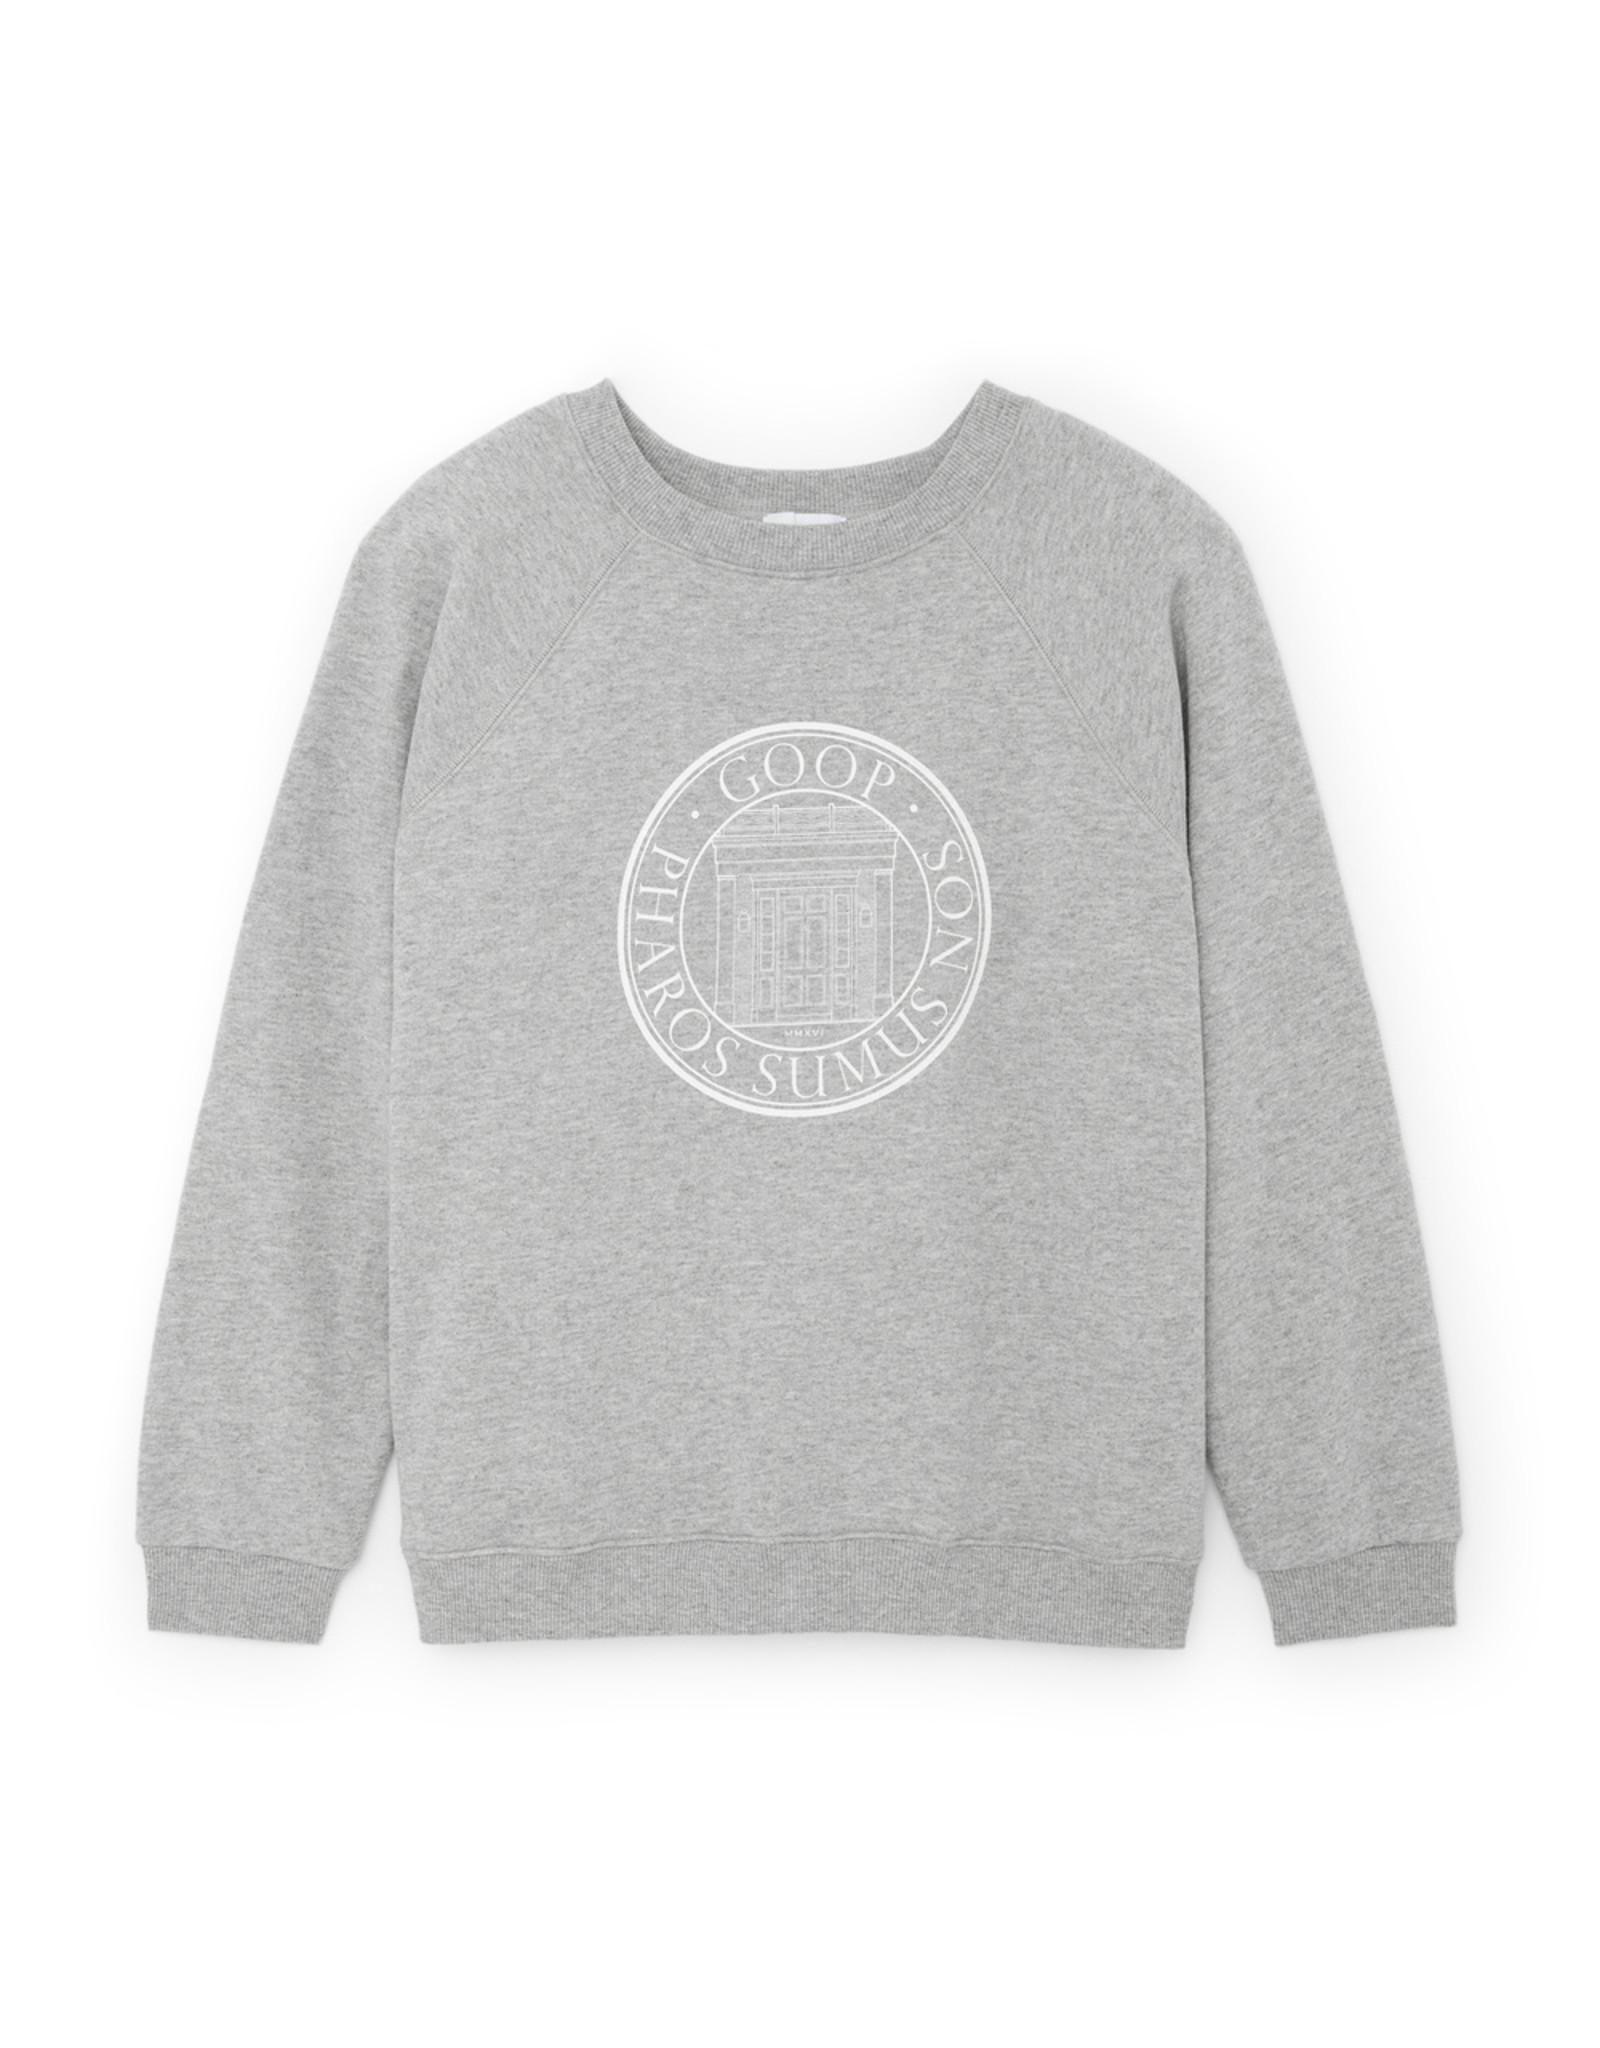 G. Label G. Label goop University Sweatshirt (Color: Grey Heather, Size: XS)